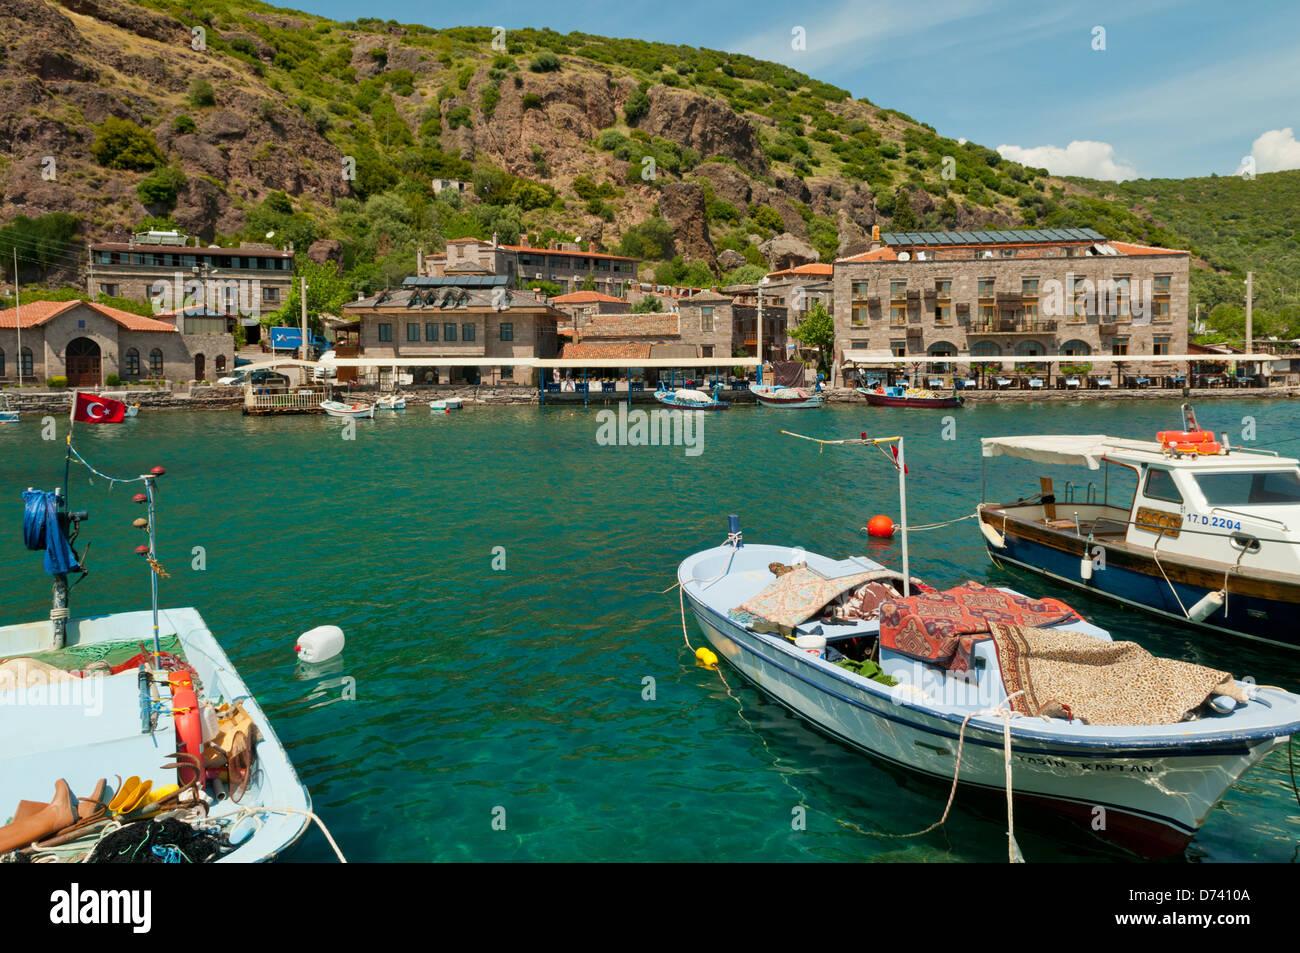 Harbour at Assos, Anatolia, Turkey - Stock Image